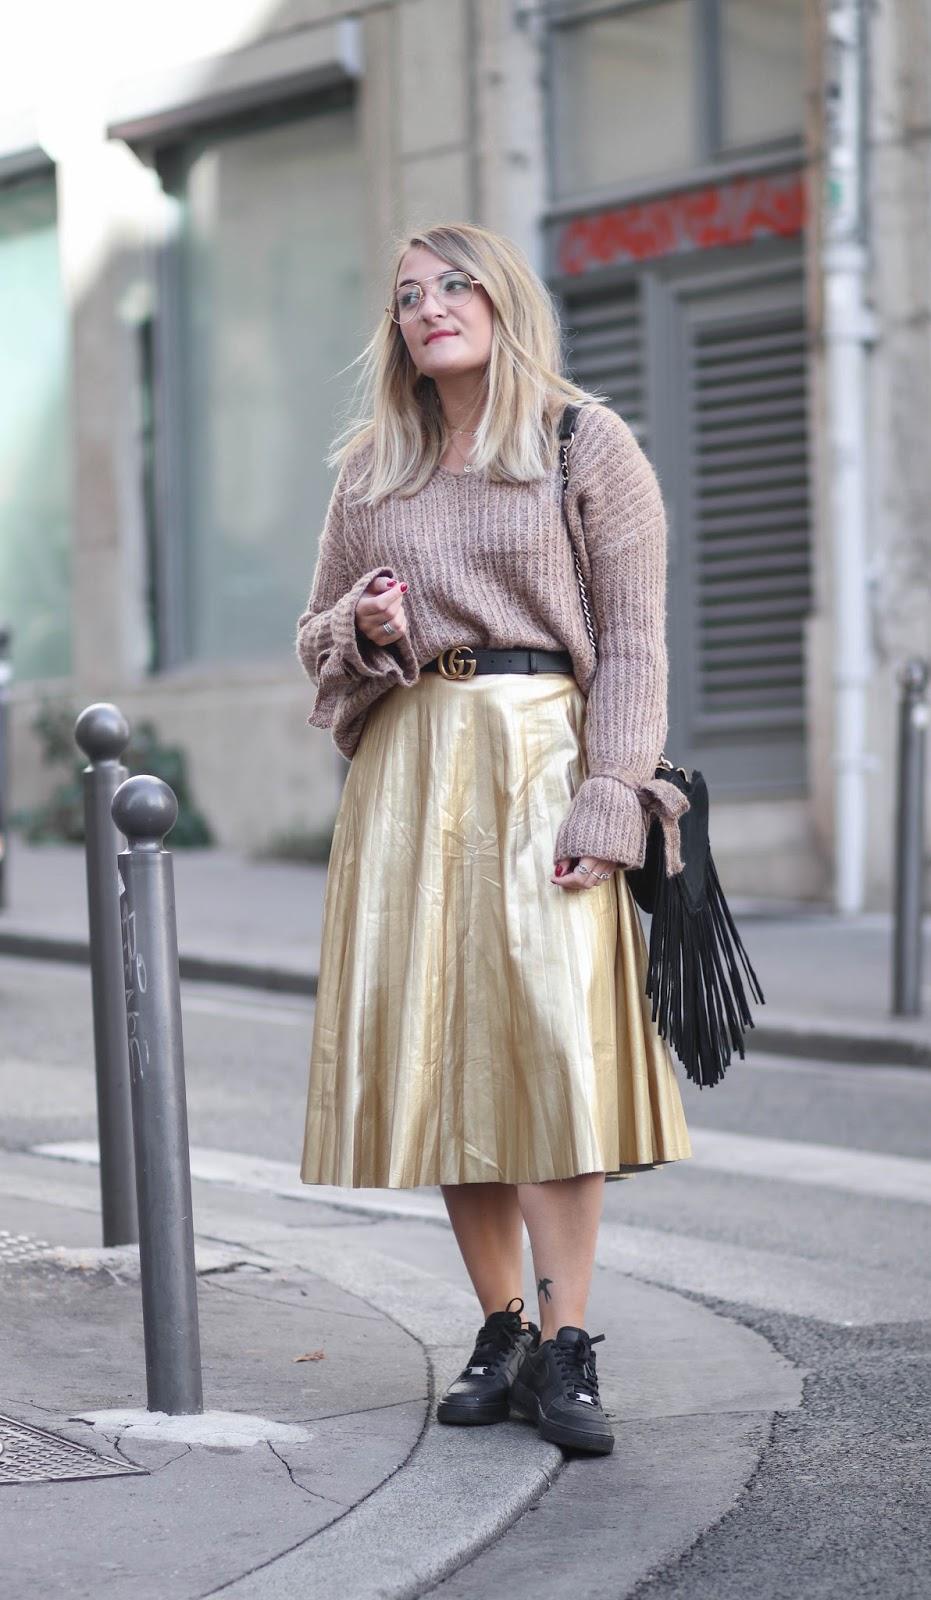 jupe dorée plisée jubylee parisgrenoble